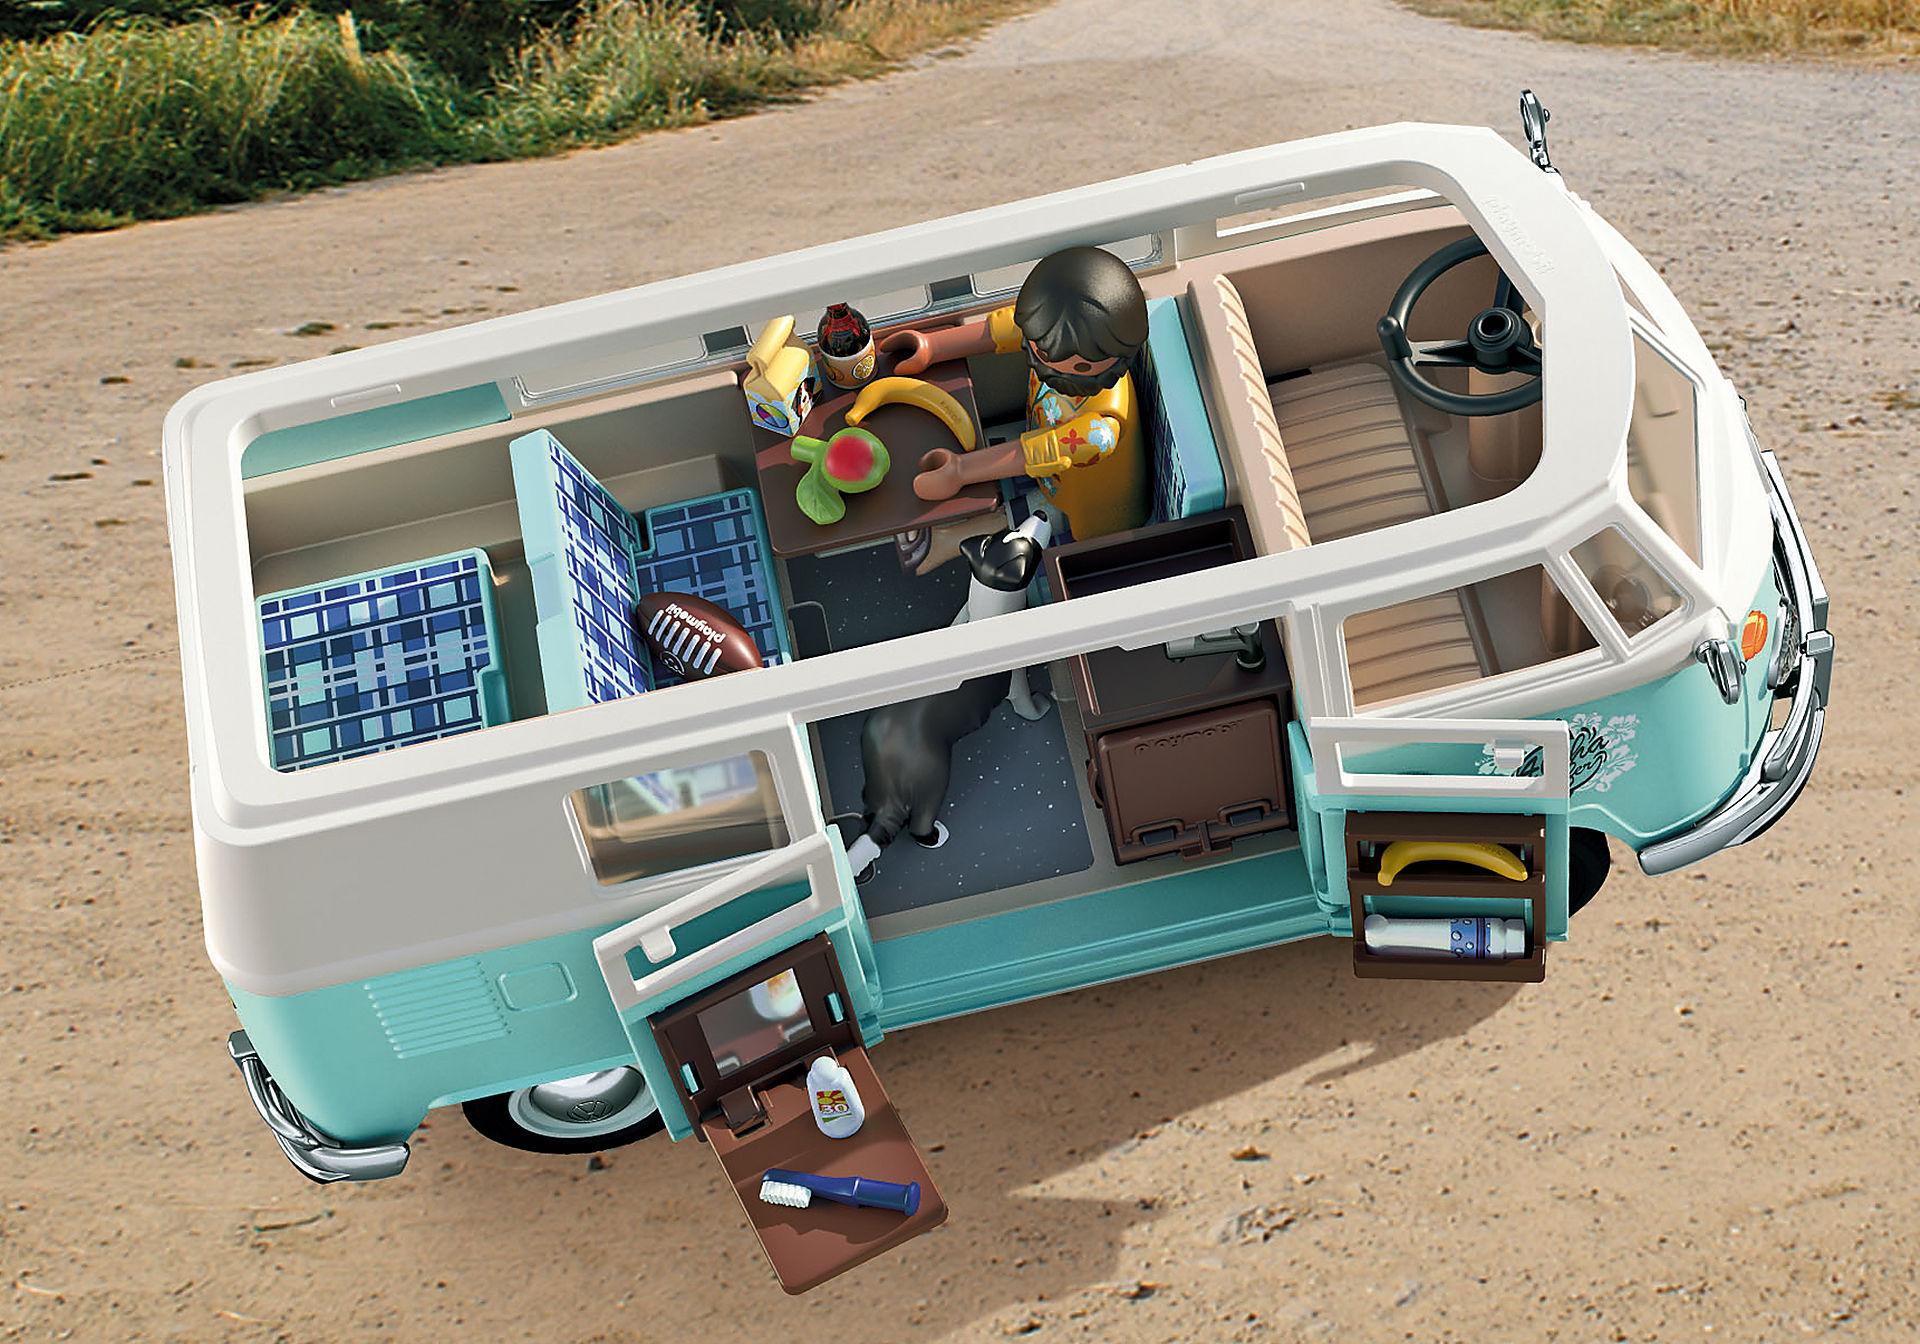 70826 Volkswagen T1 Campingbus - Special Edition zoom image8